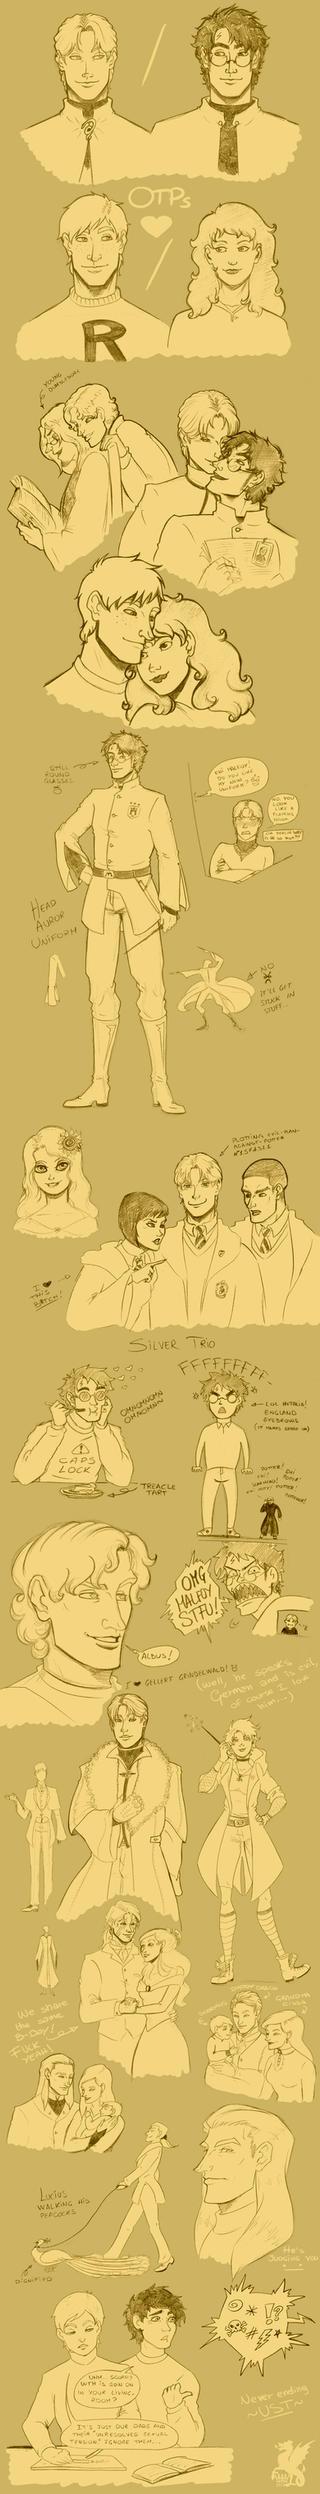 HP - Potternesssss by Dracontessa